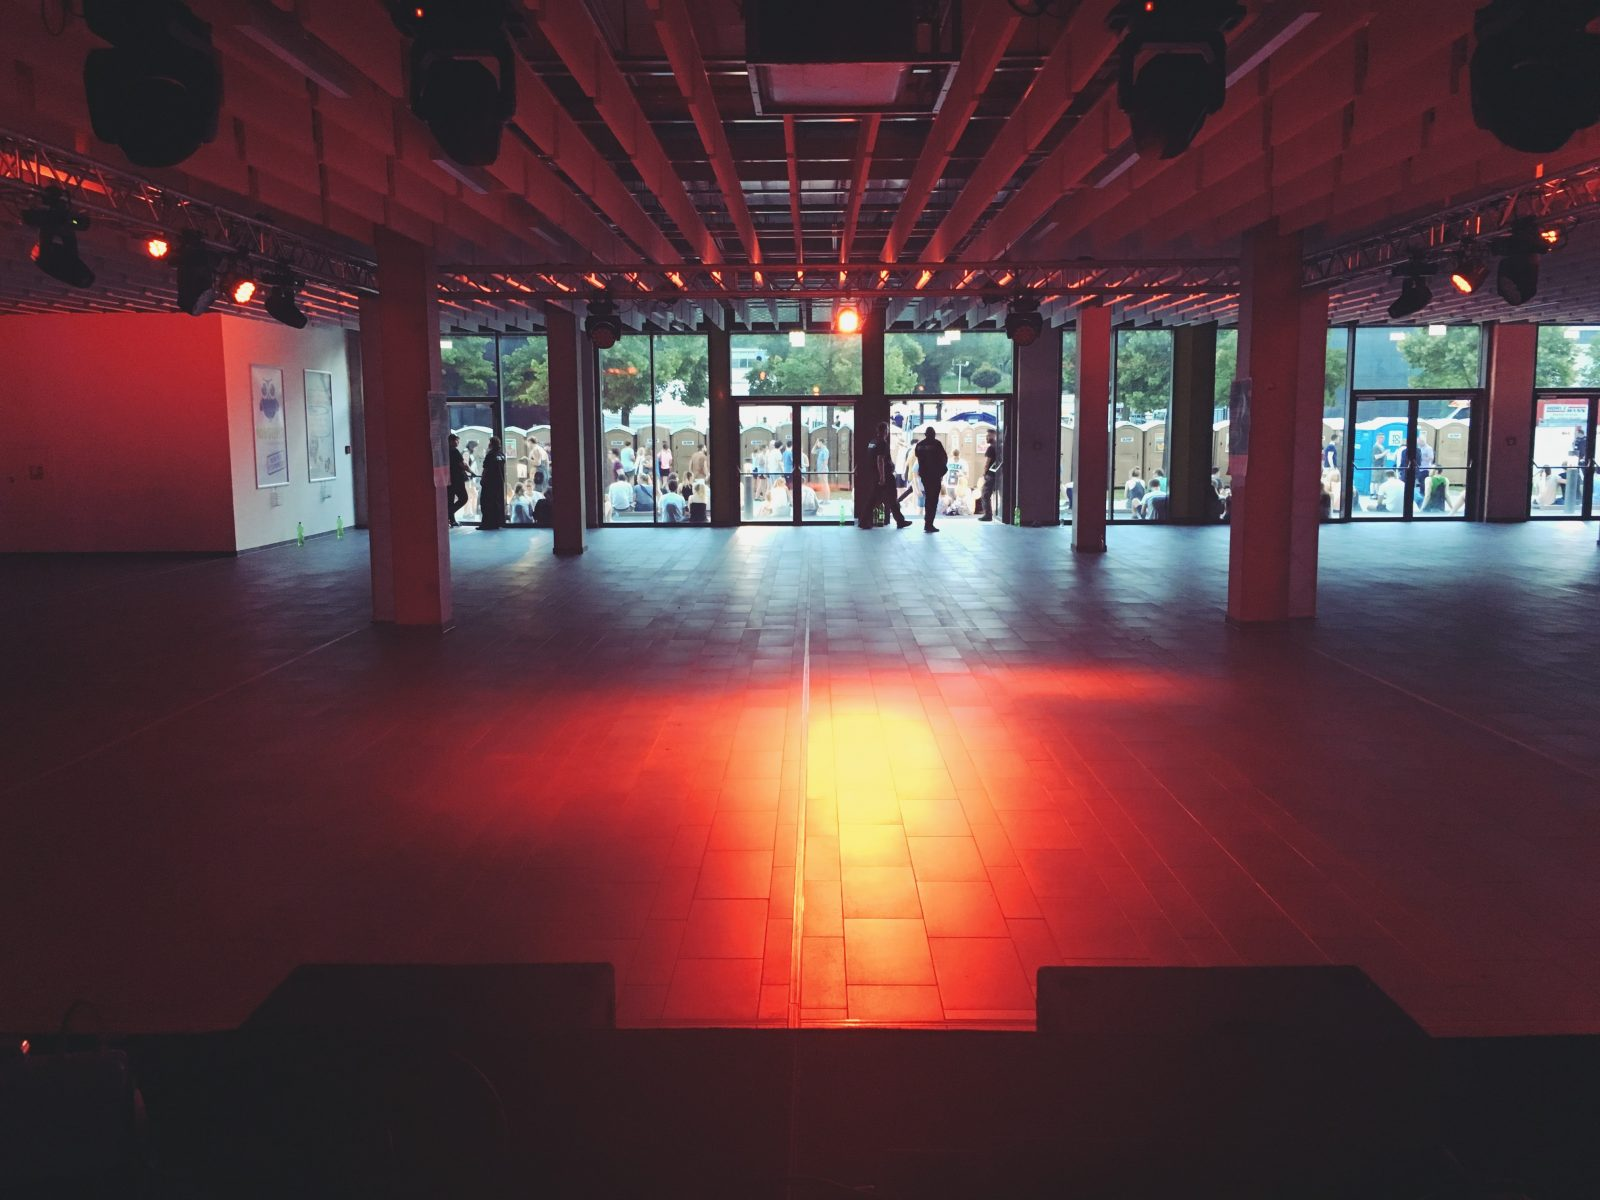 Campus Festival Bielefeld Dancefloor statt Netflix and Chill